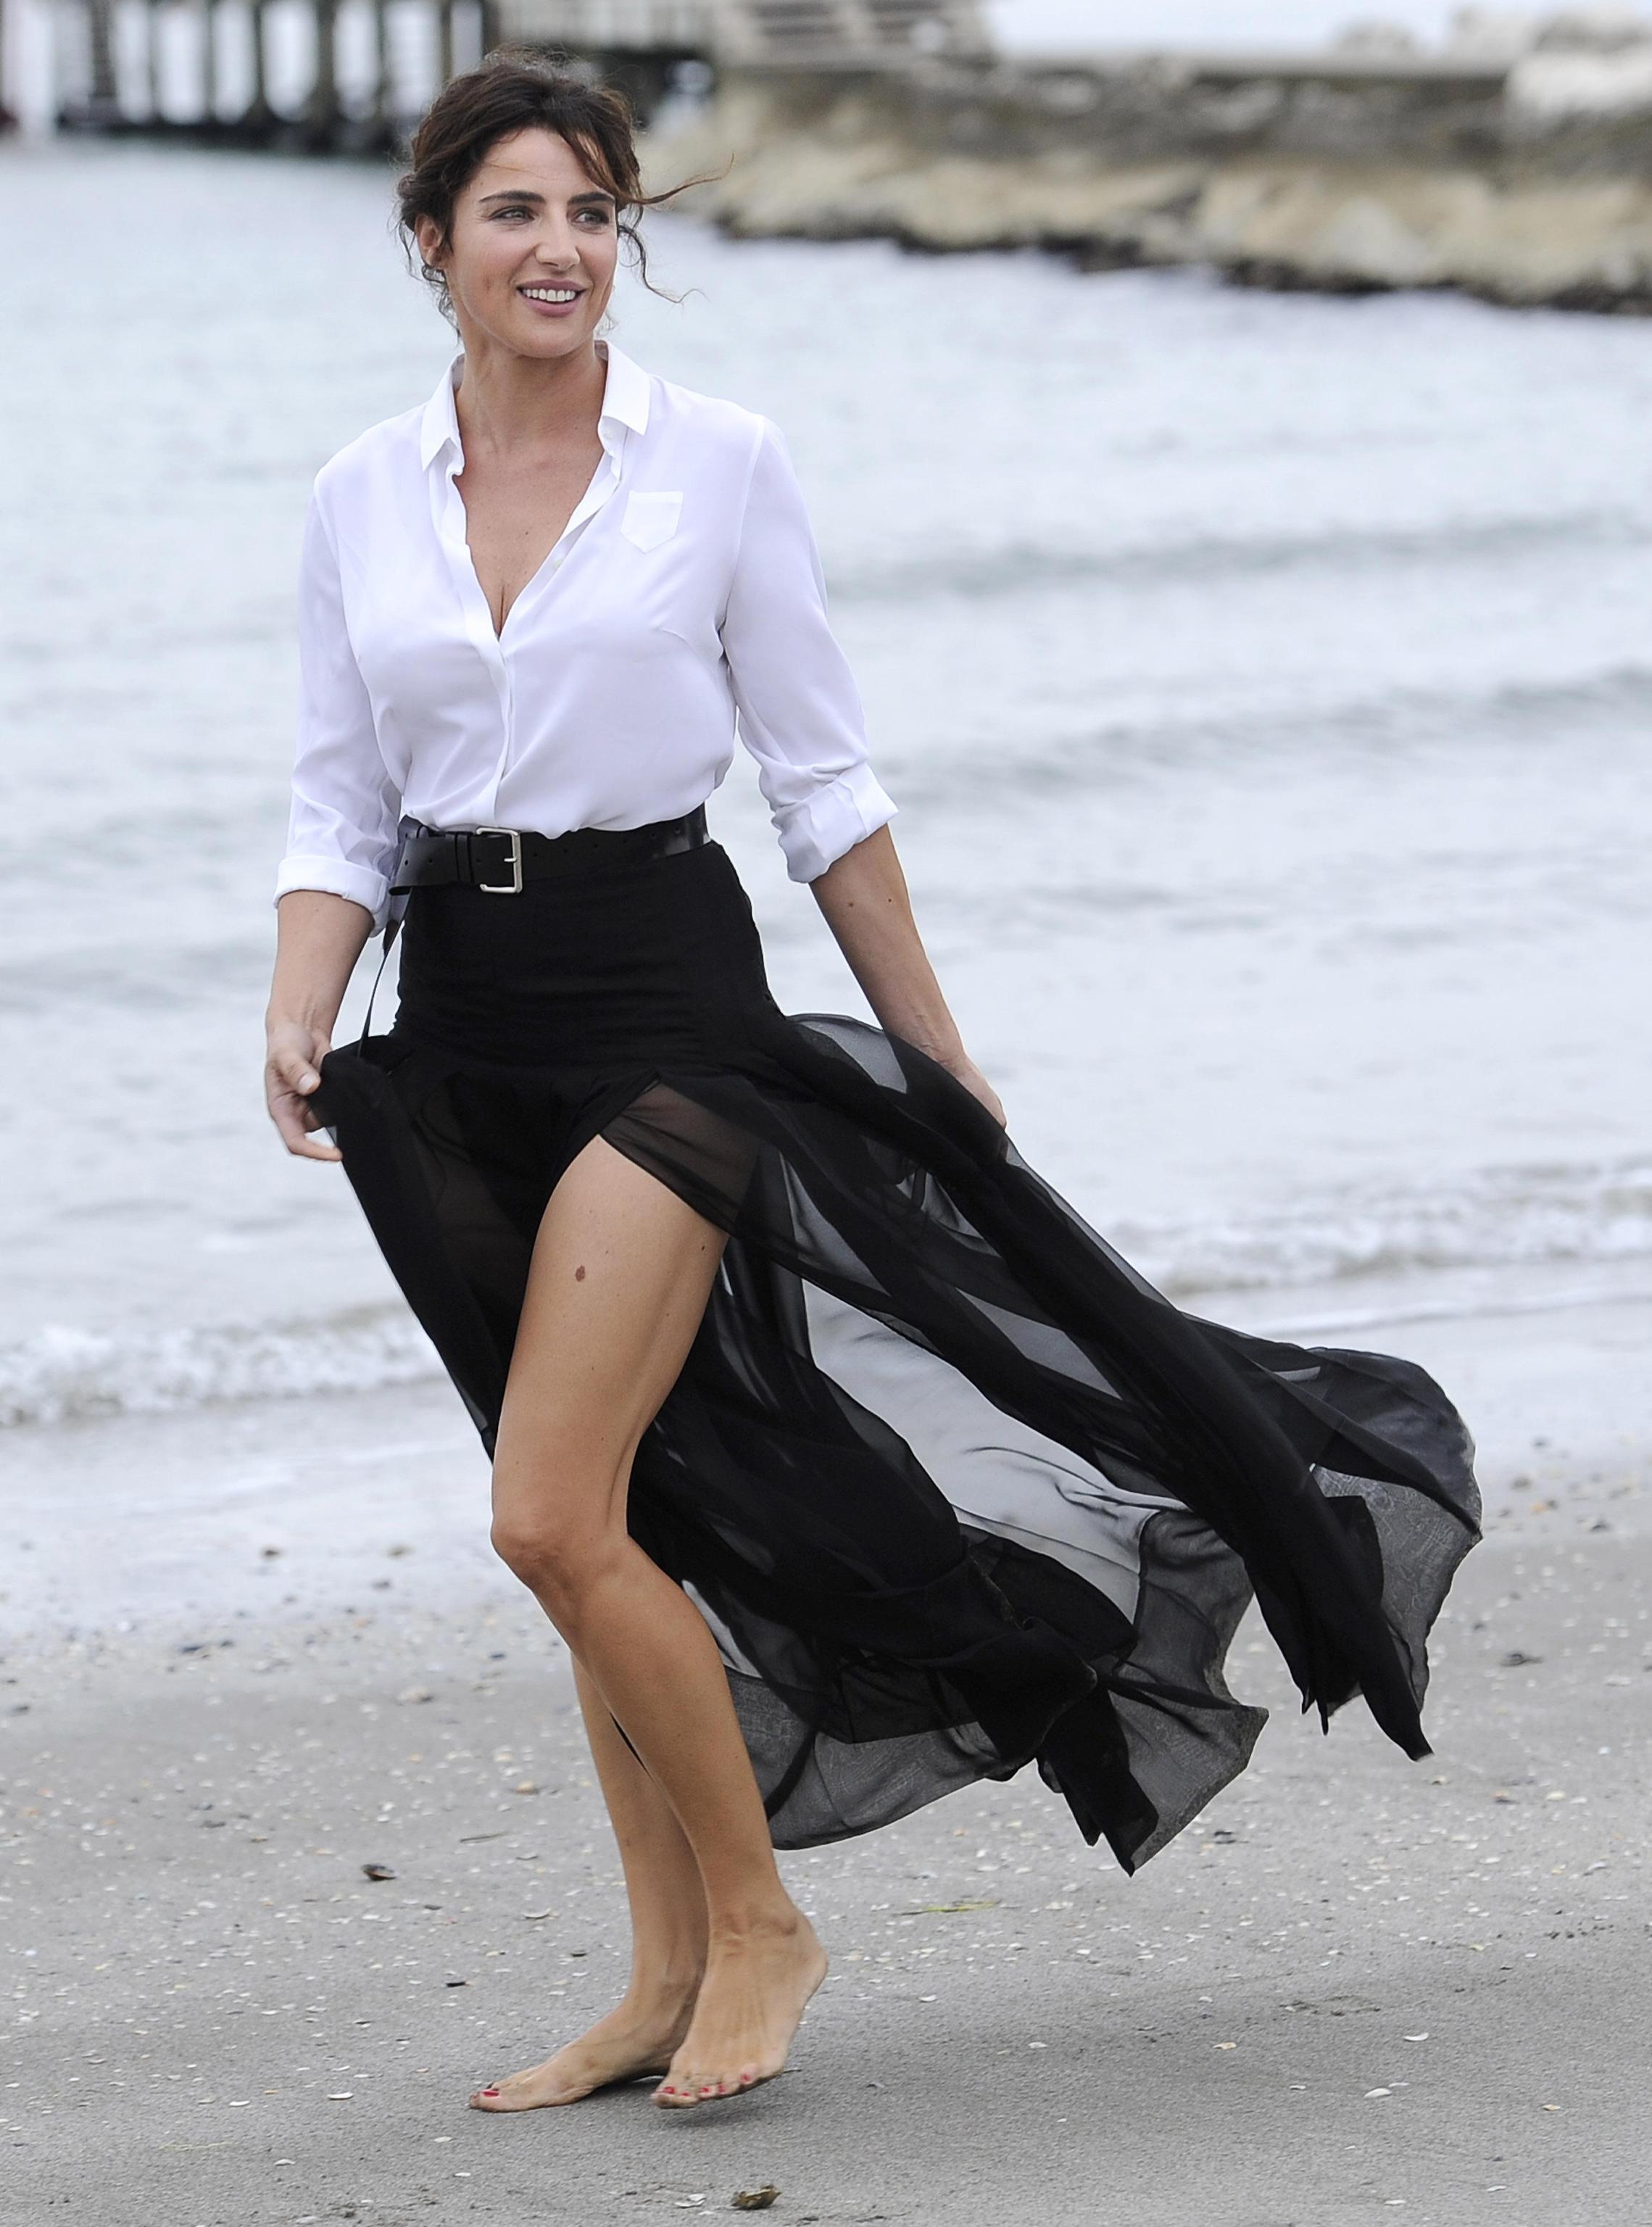 Luisa Ranieri nude (53 foto and video), Topless, Cleavage, Feet, butt 2006